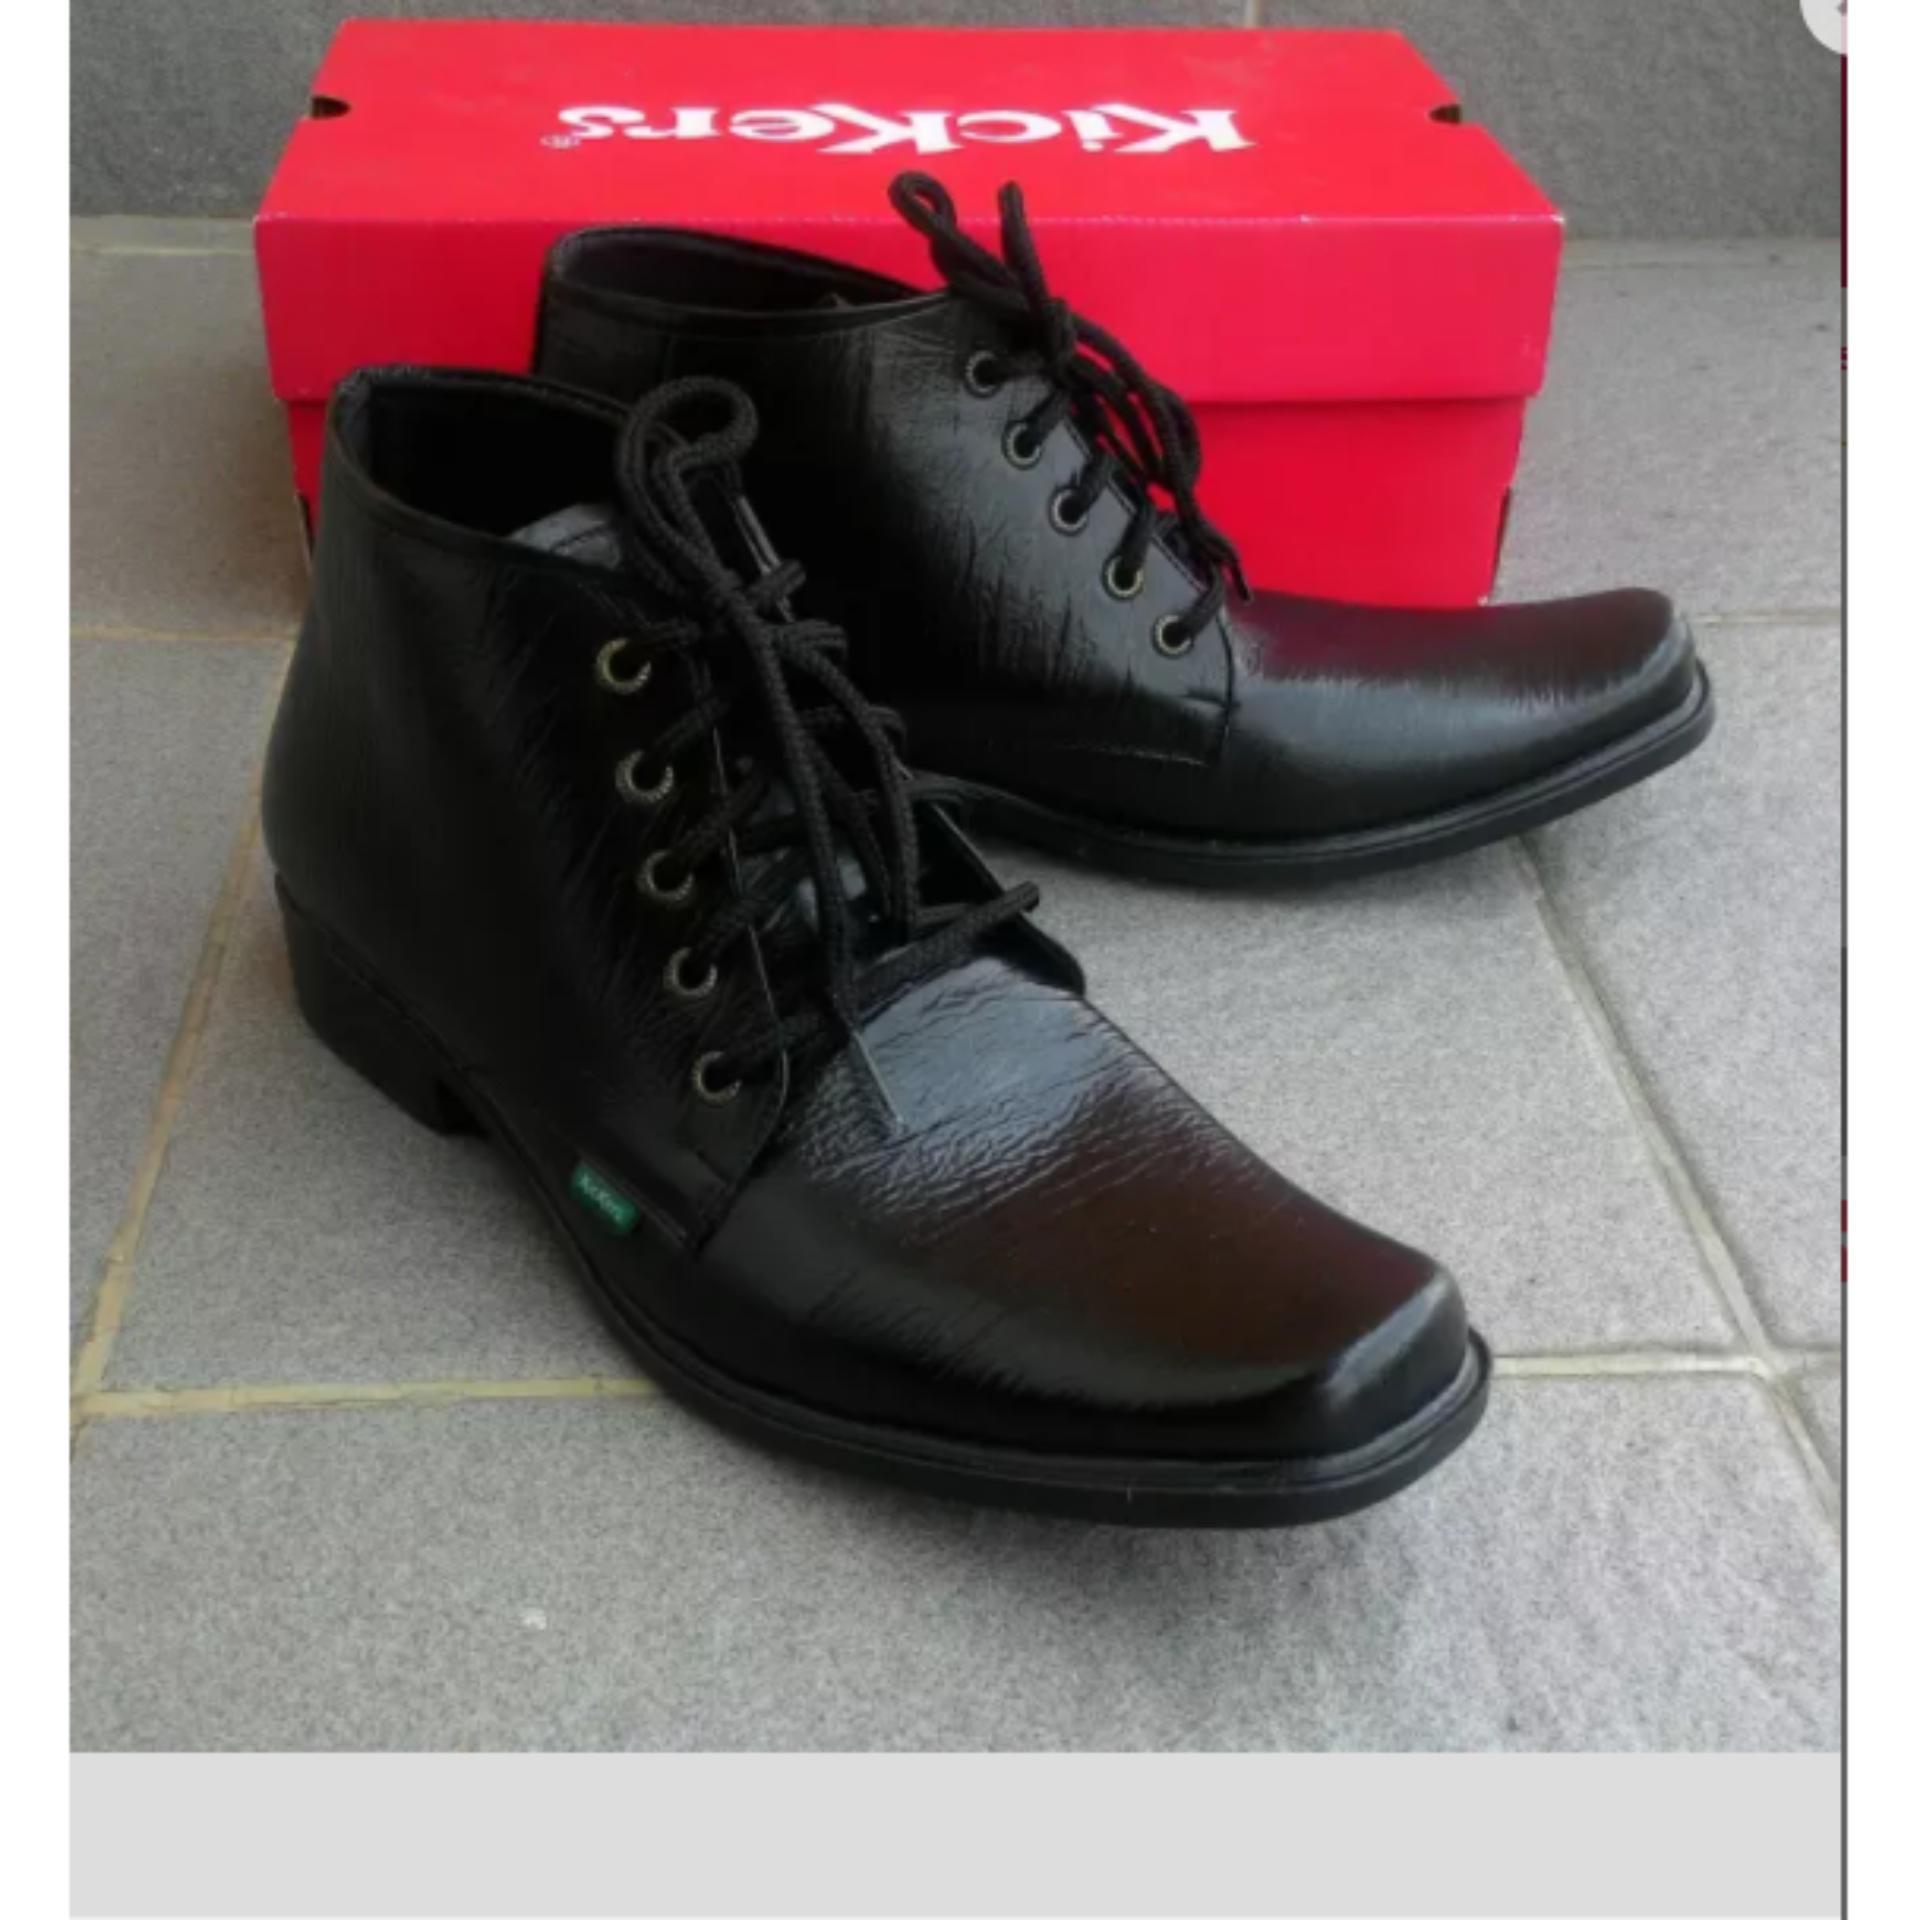 Jual Sepatu Pantofel Kulit Kickers Kantor Kerja Pormal Formal Boots